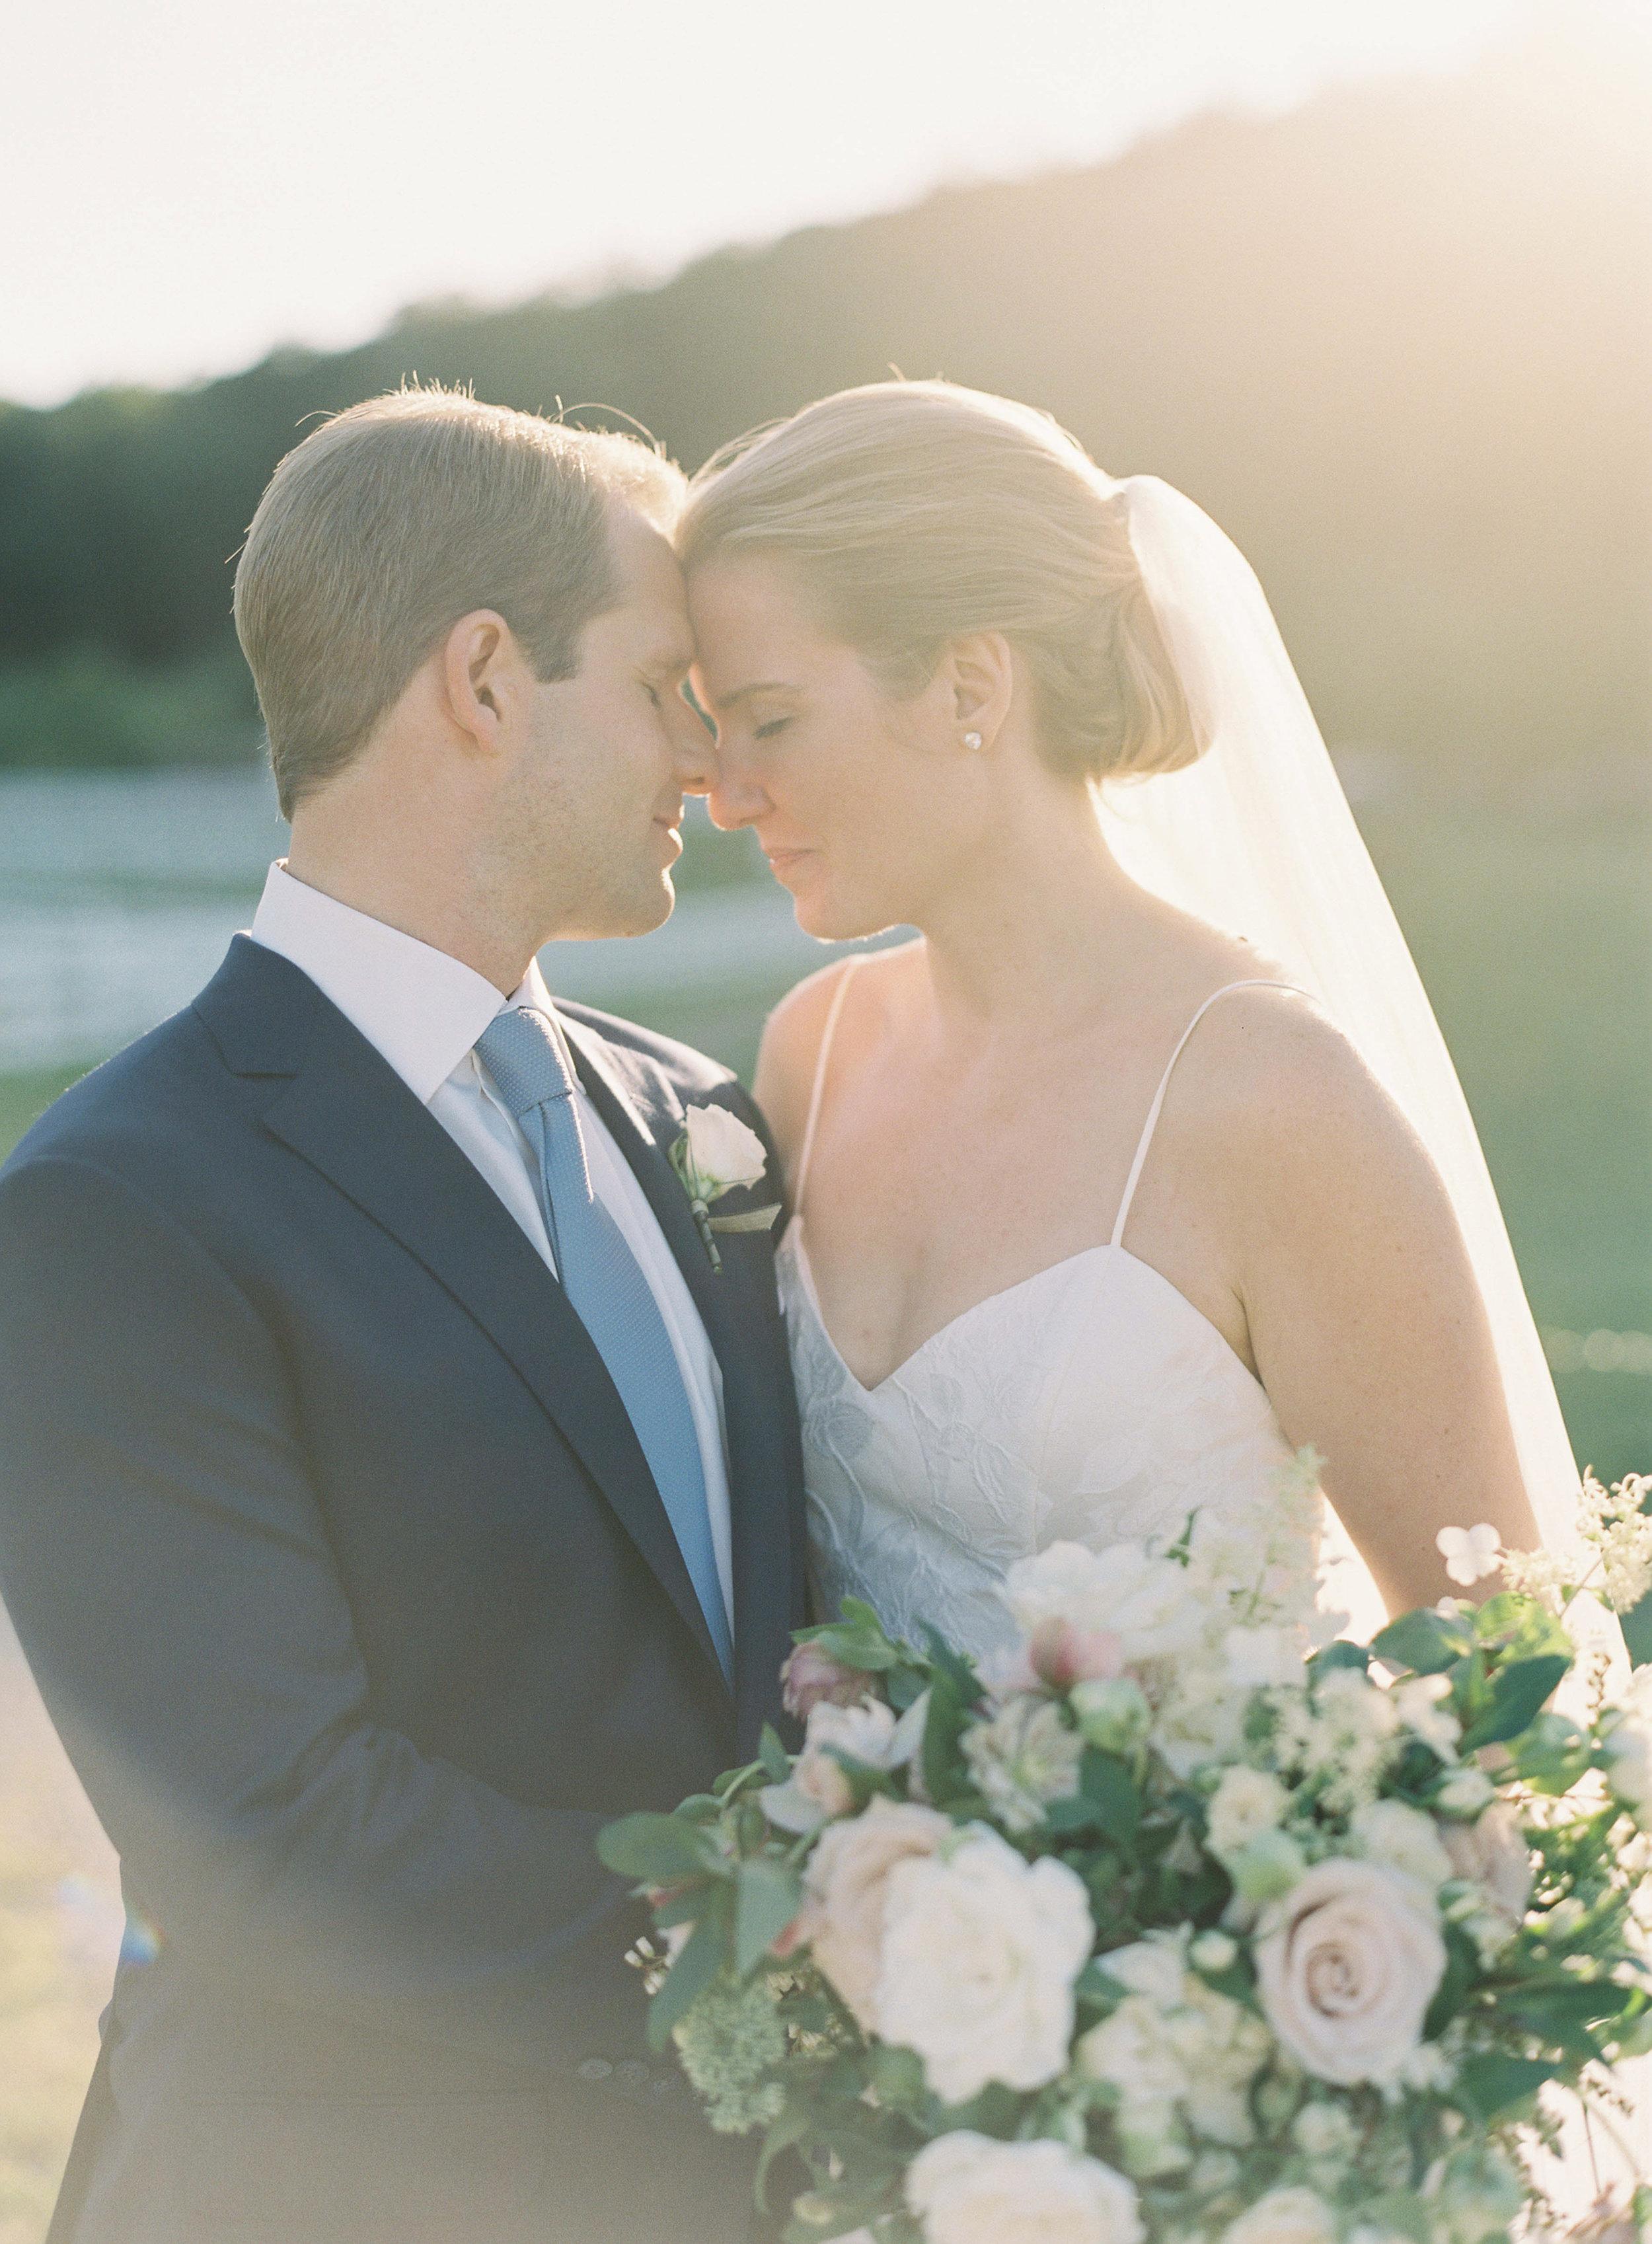 Connecticut-Wedding-21-Jen-Huang-20170909-KB-360-Jen_Huang-006806-R1-009.jpg